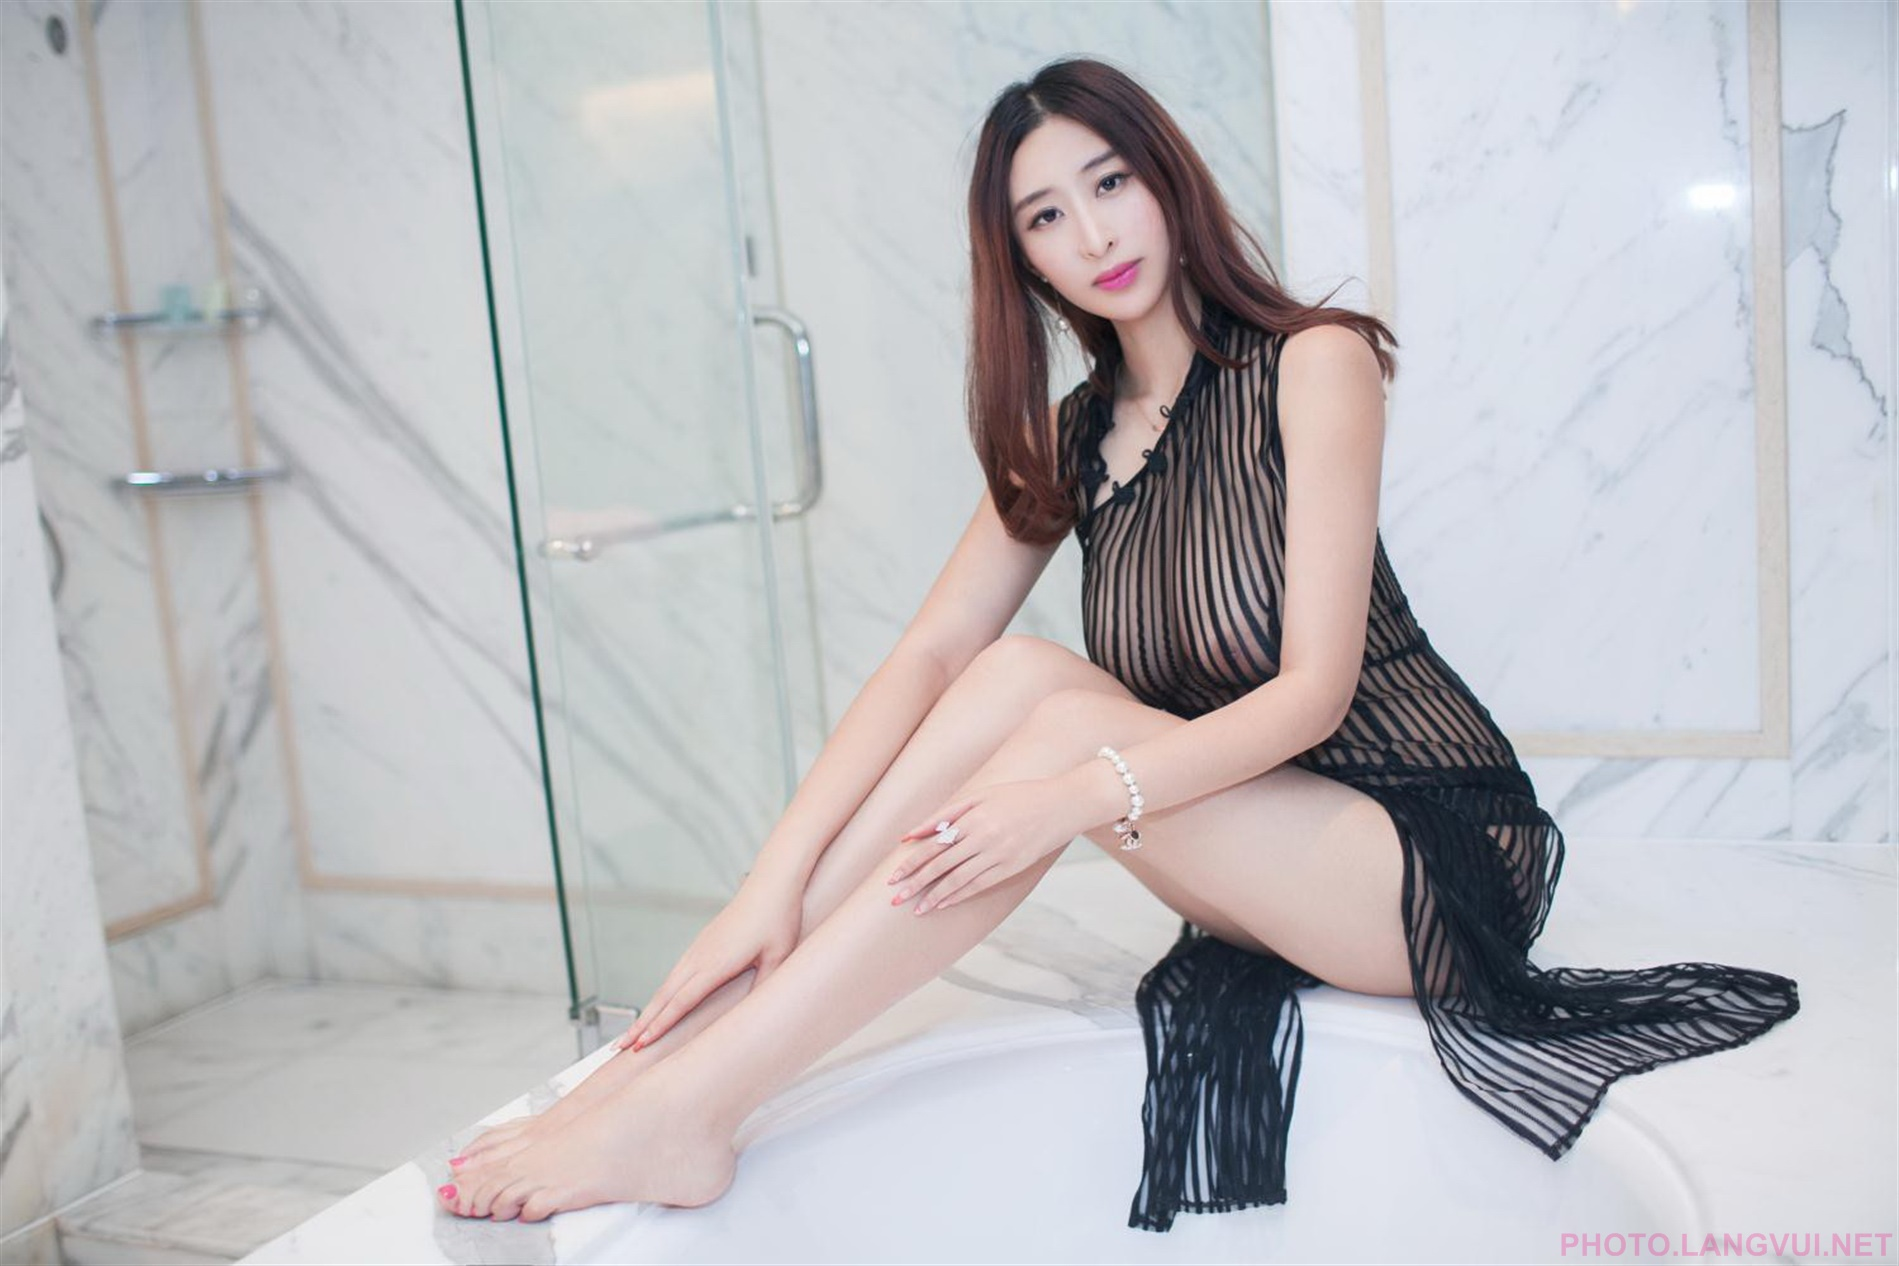 TUIGIRL No 052 - Page 5 of 5 - Ảnh Girl Xinh - photo